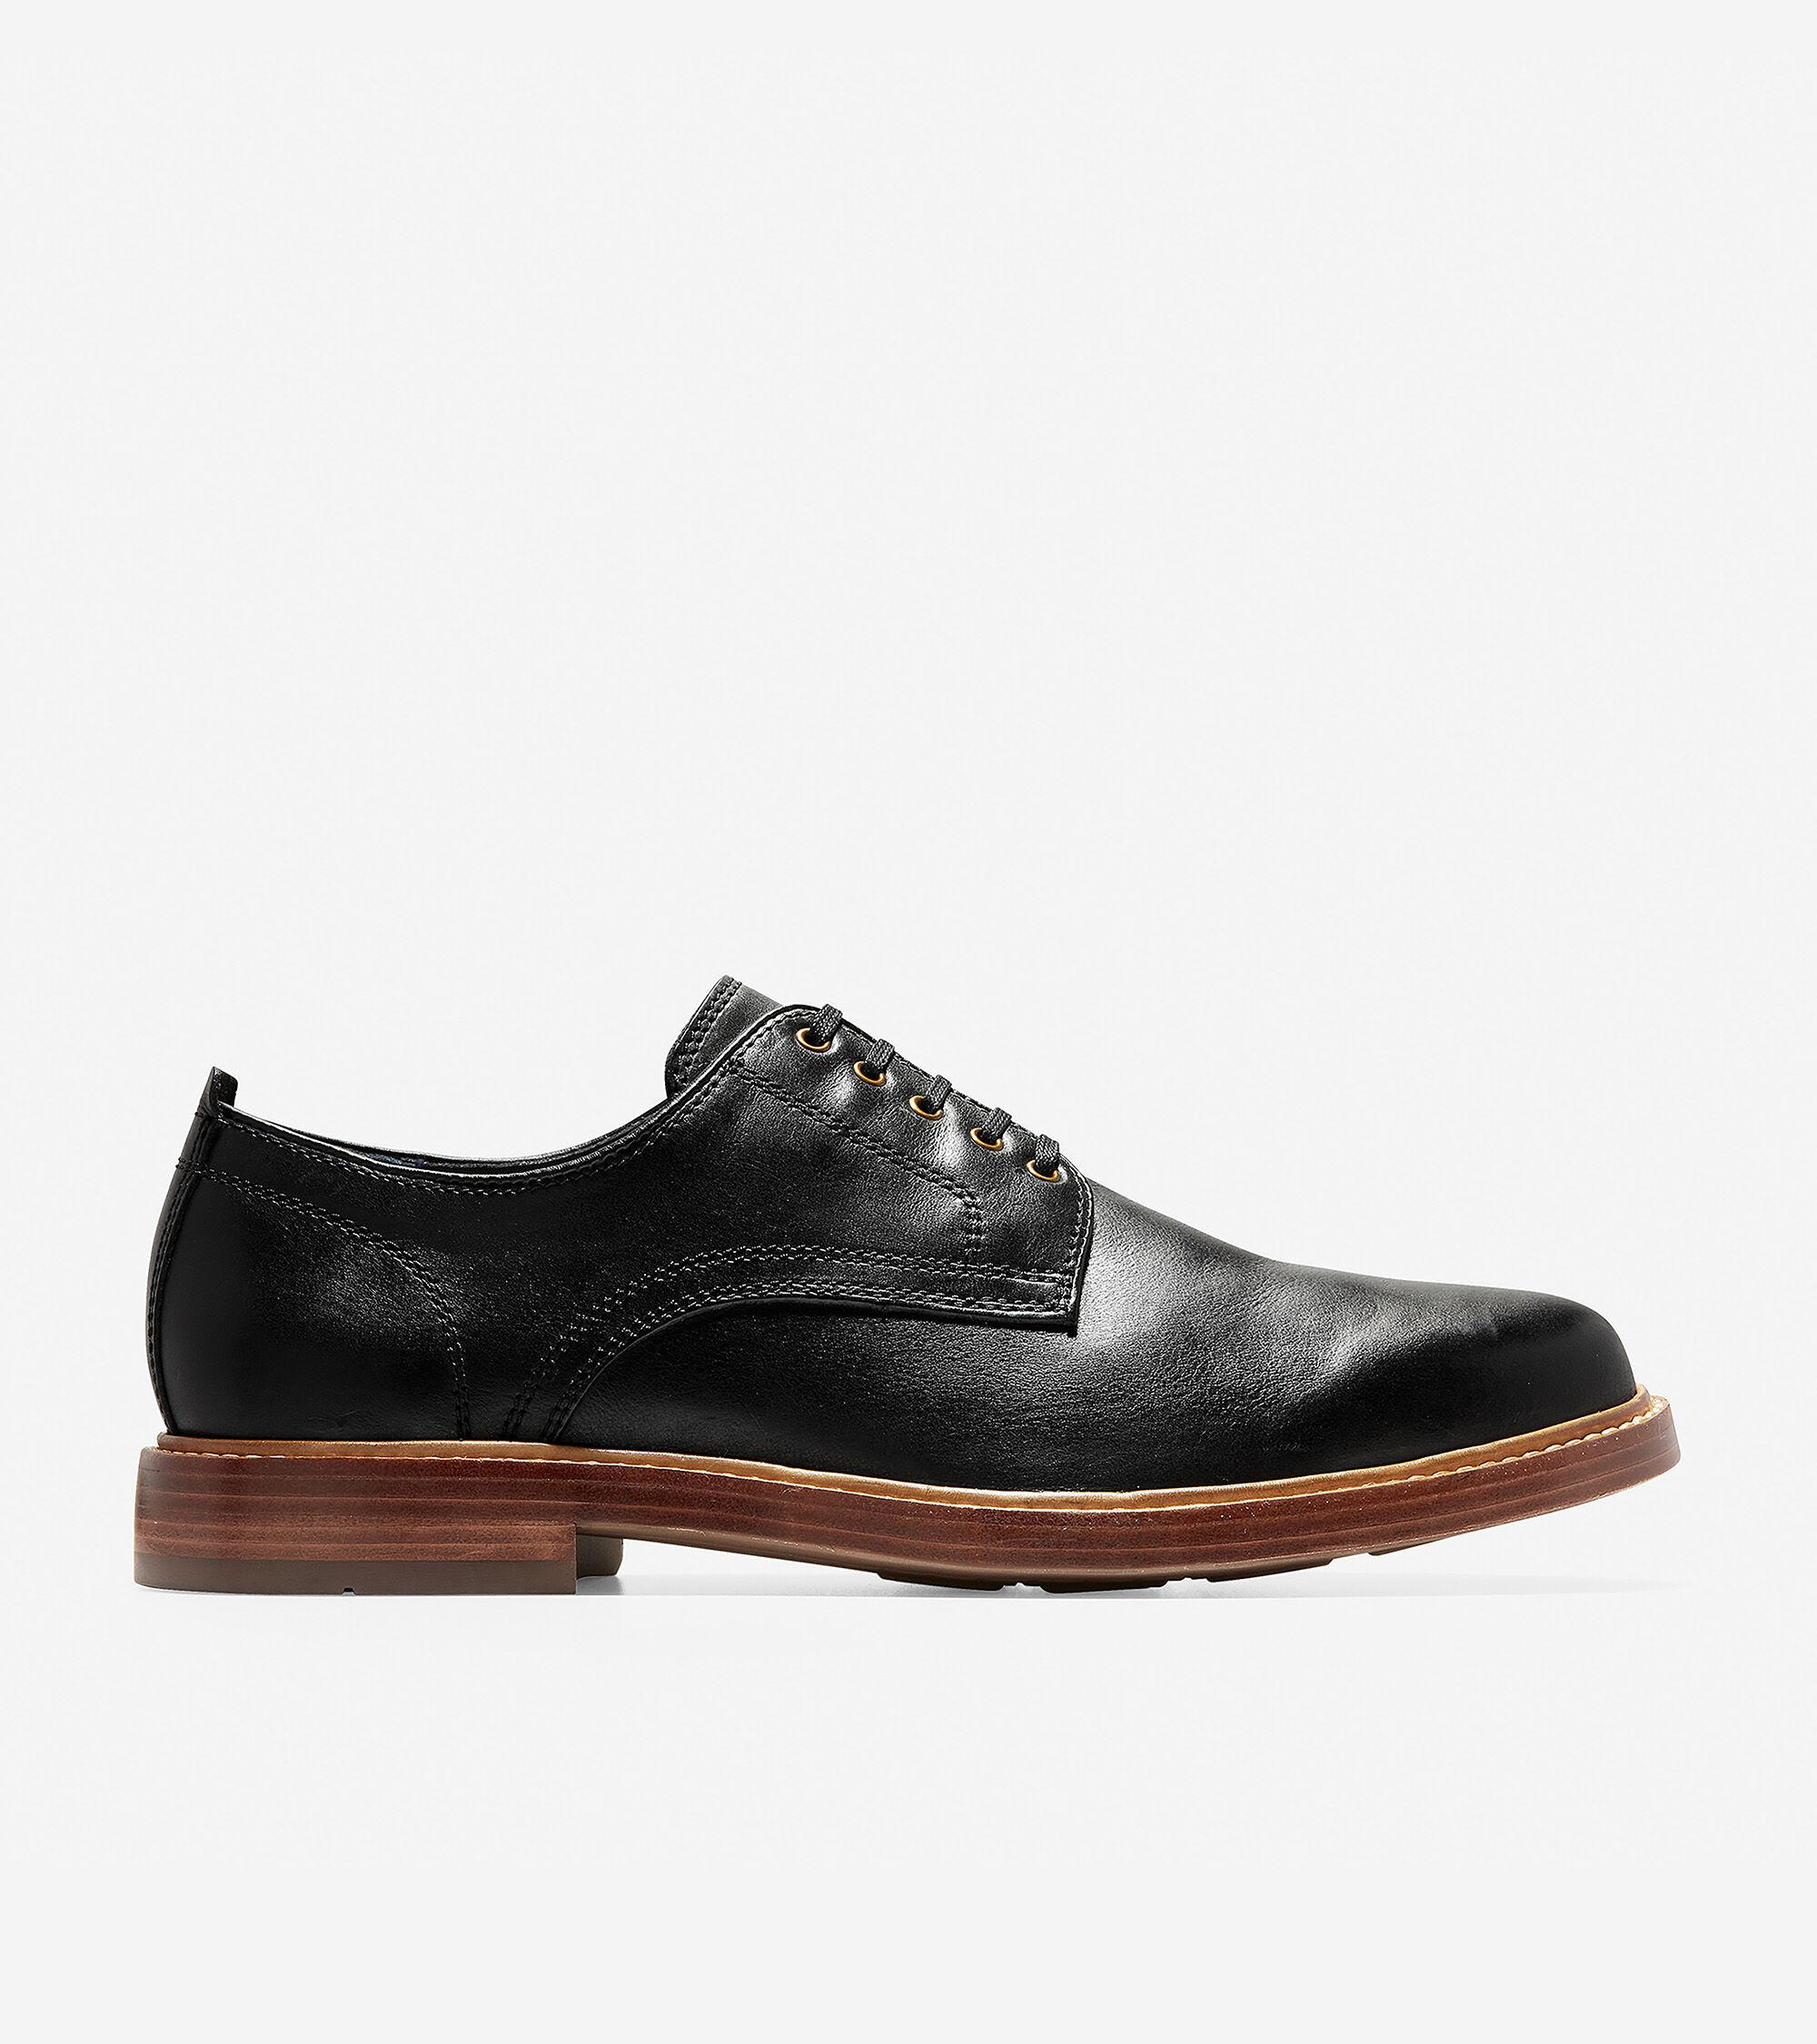 Cole Haan Men's Tyler Grand Plain Toe Oxford Shoes